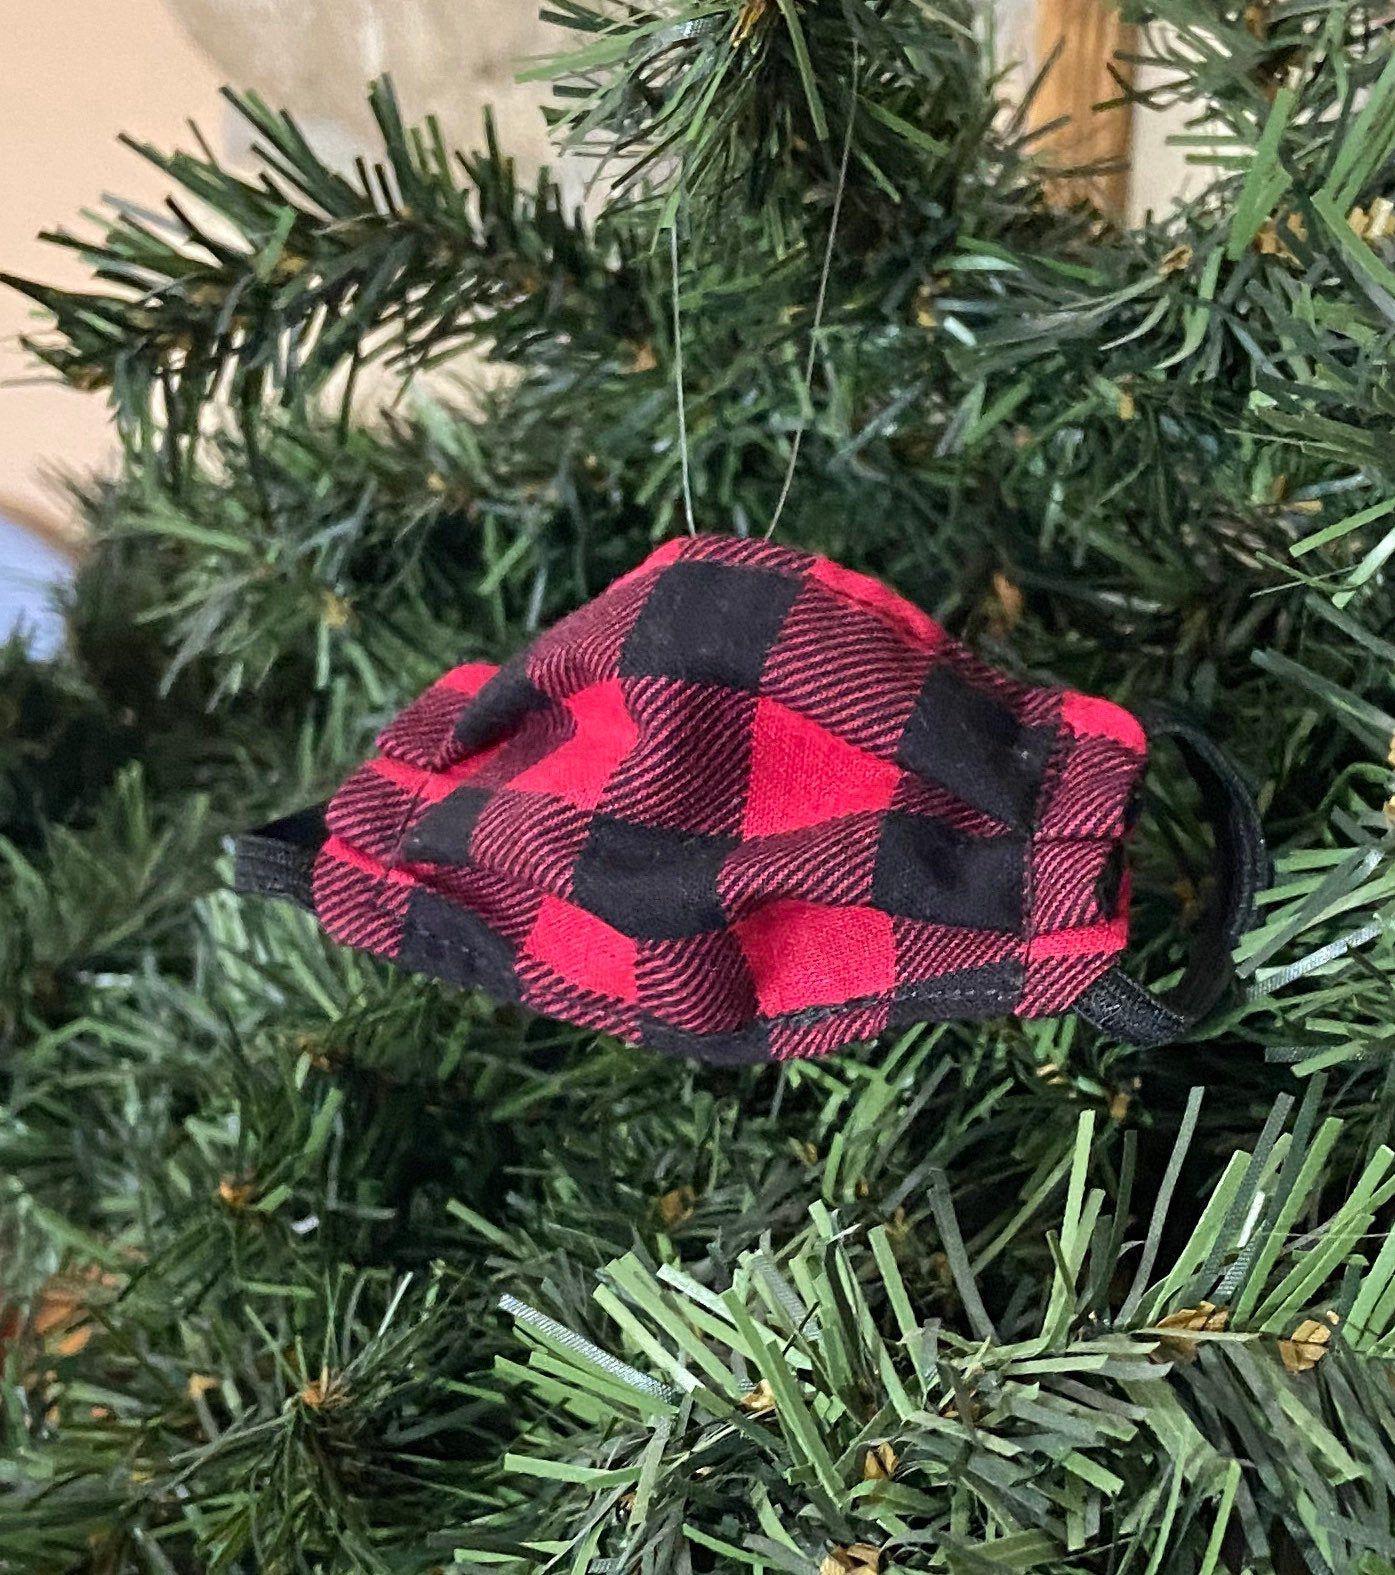 Mini Mask Ornament Buffalo Plaid Christmas Ornament 2020 Etsy In 2020 Diy Christmas Ornaments Fabric Christmas Ornaments Diy Christmas Ornaments Easy